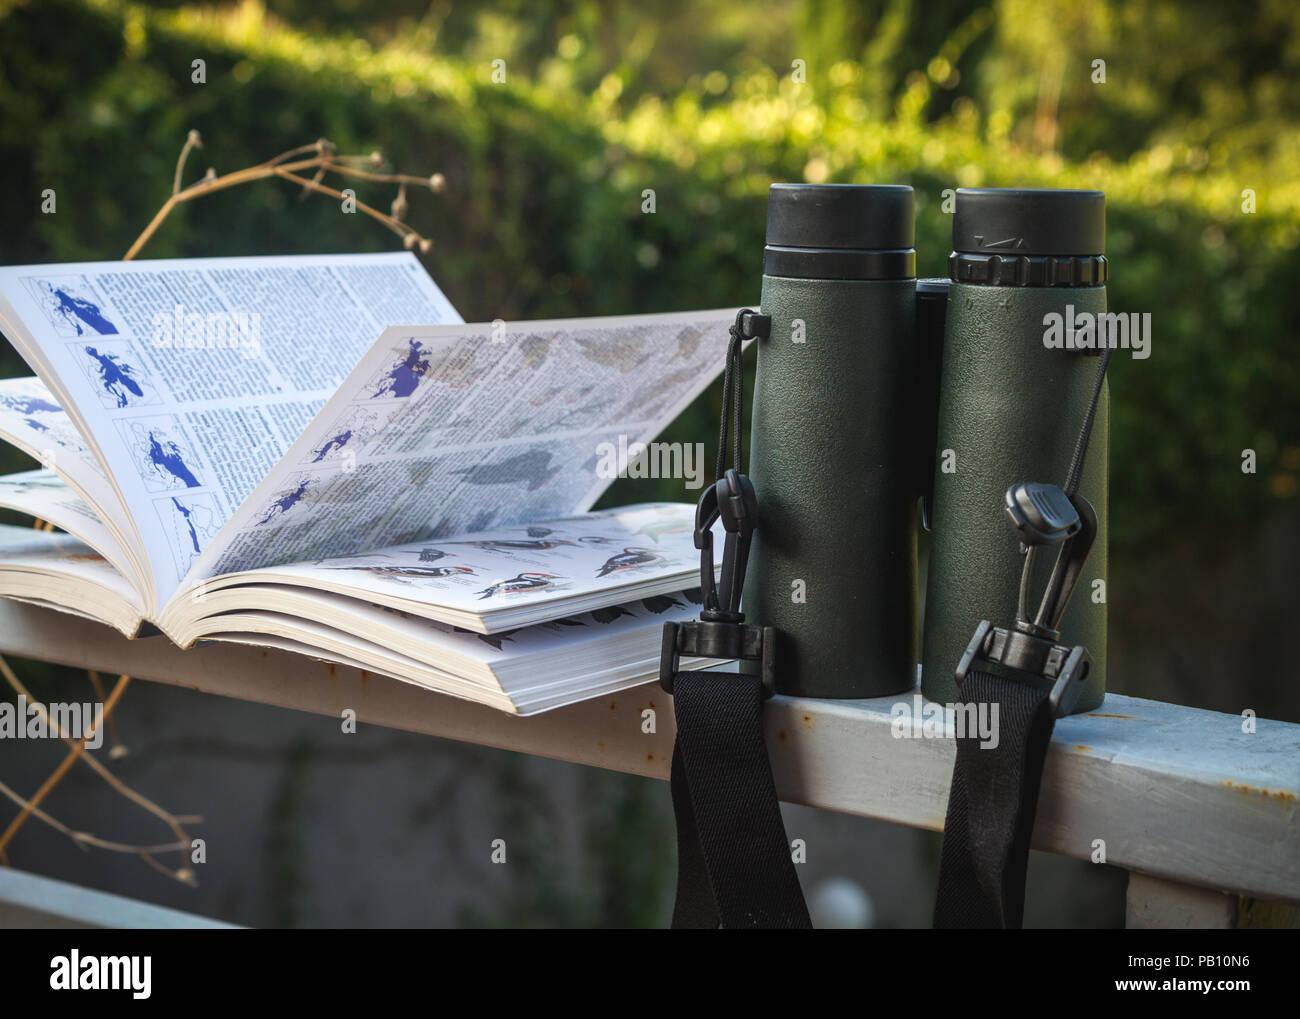 Porro prisma fernglas teleskop best buy vogelbeobachtung